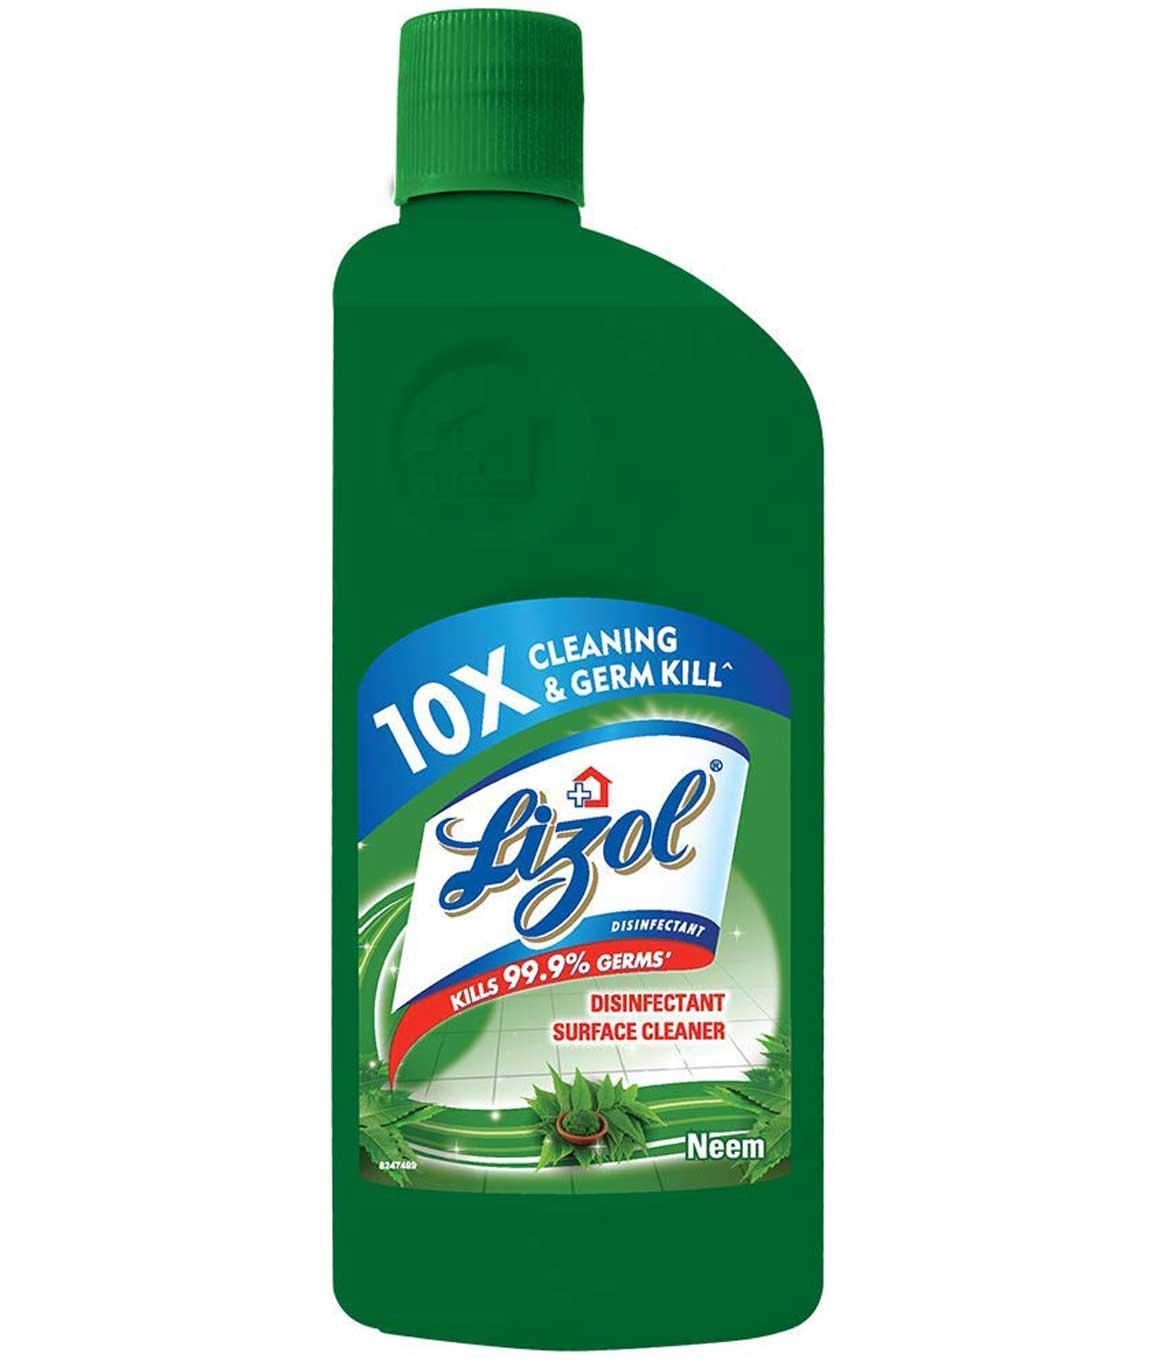 Lizol Disinfectant Surface Cleaner - 500 ml (Neem)